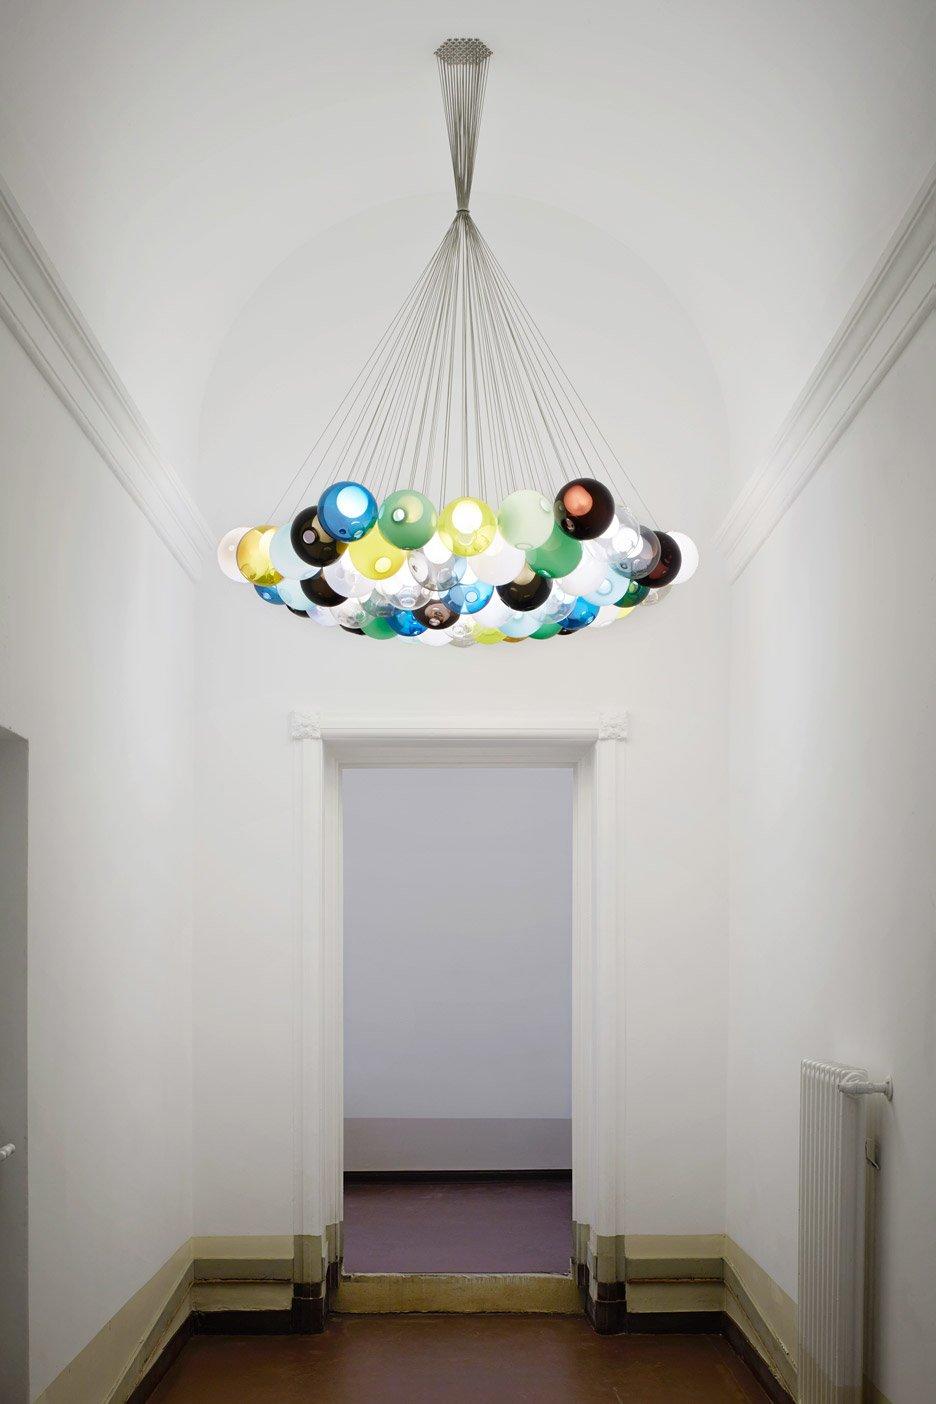 top omer arbel. Top Omer Arbel. Bocci79 Exhibition By Bocci Arbel